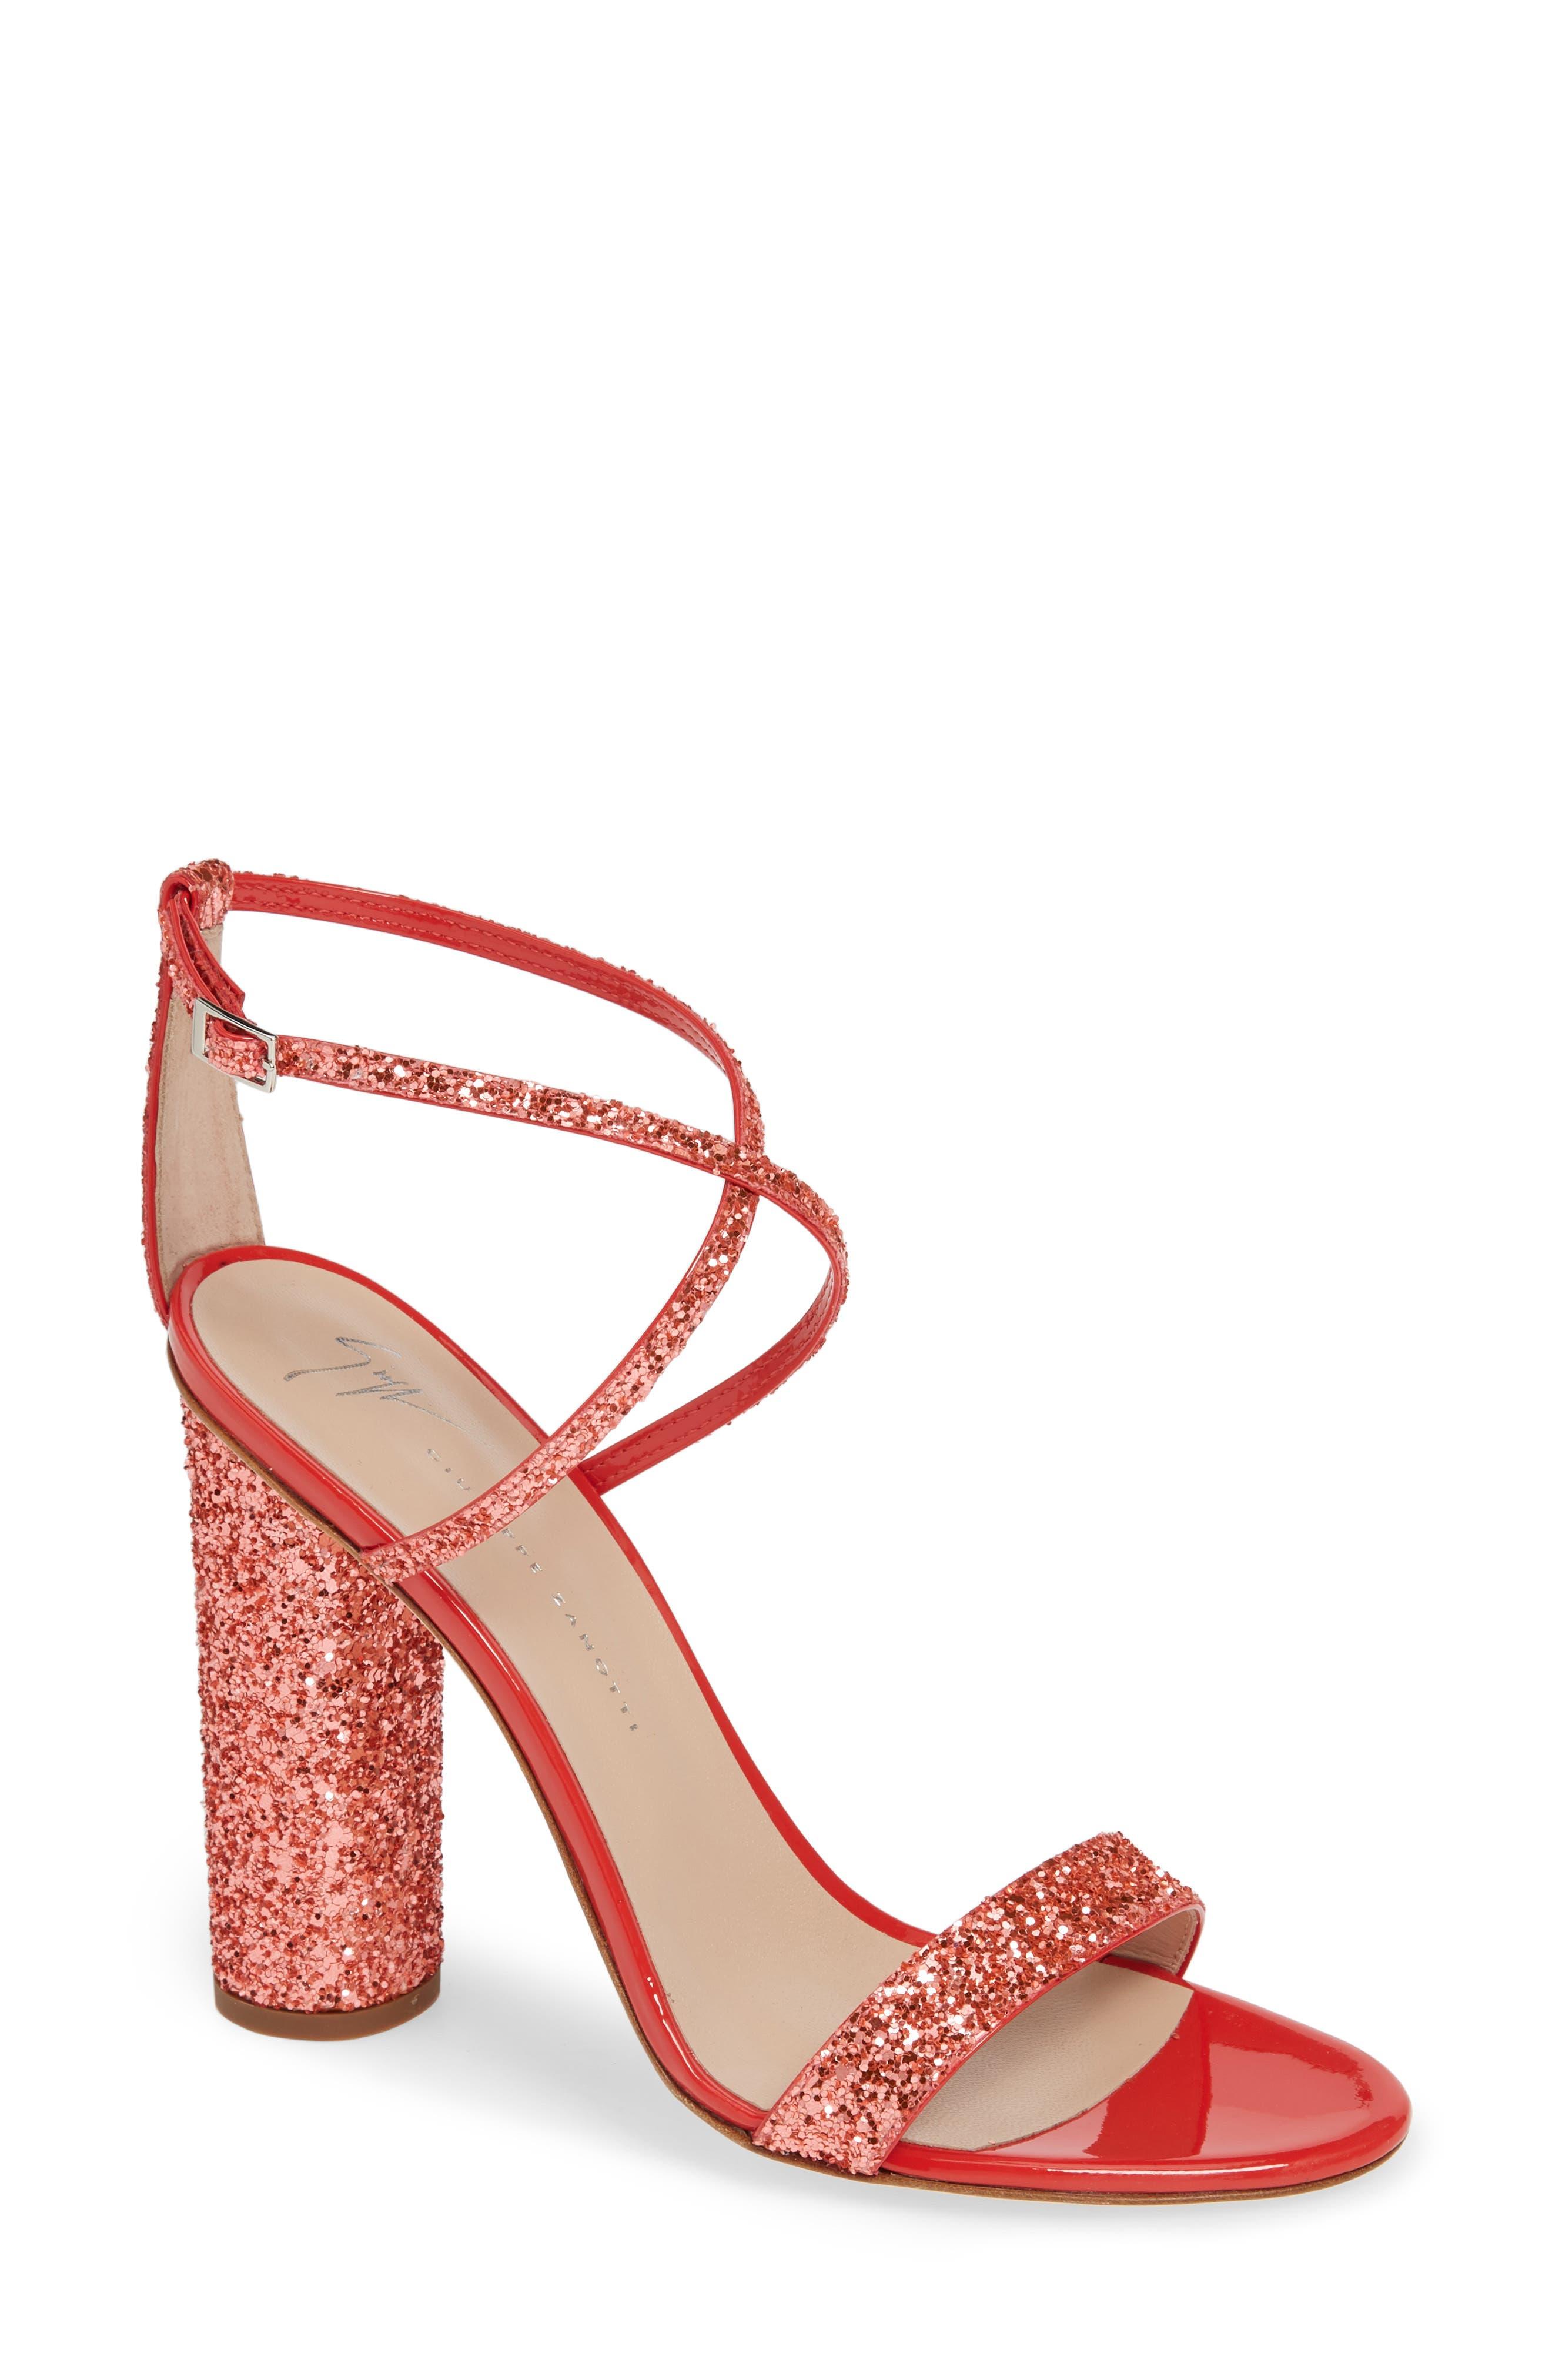 Giuseppe Zanotti Glitter Heel Sandal, Coral